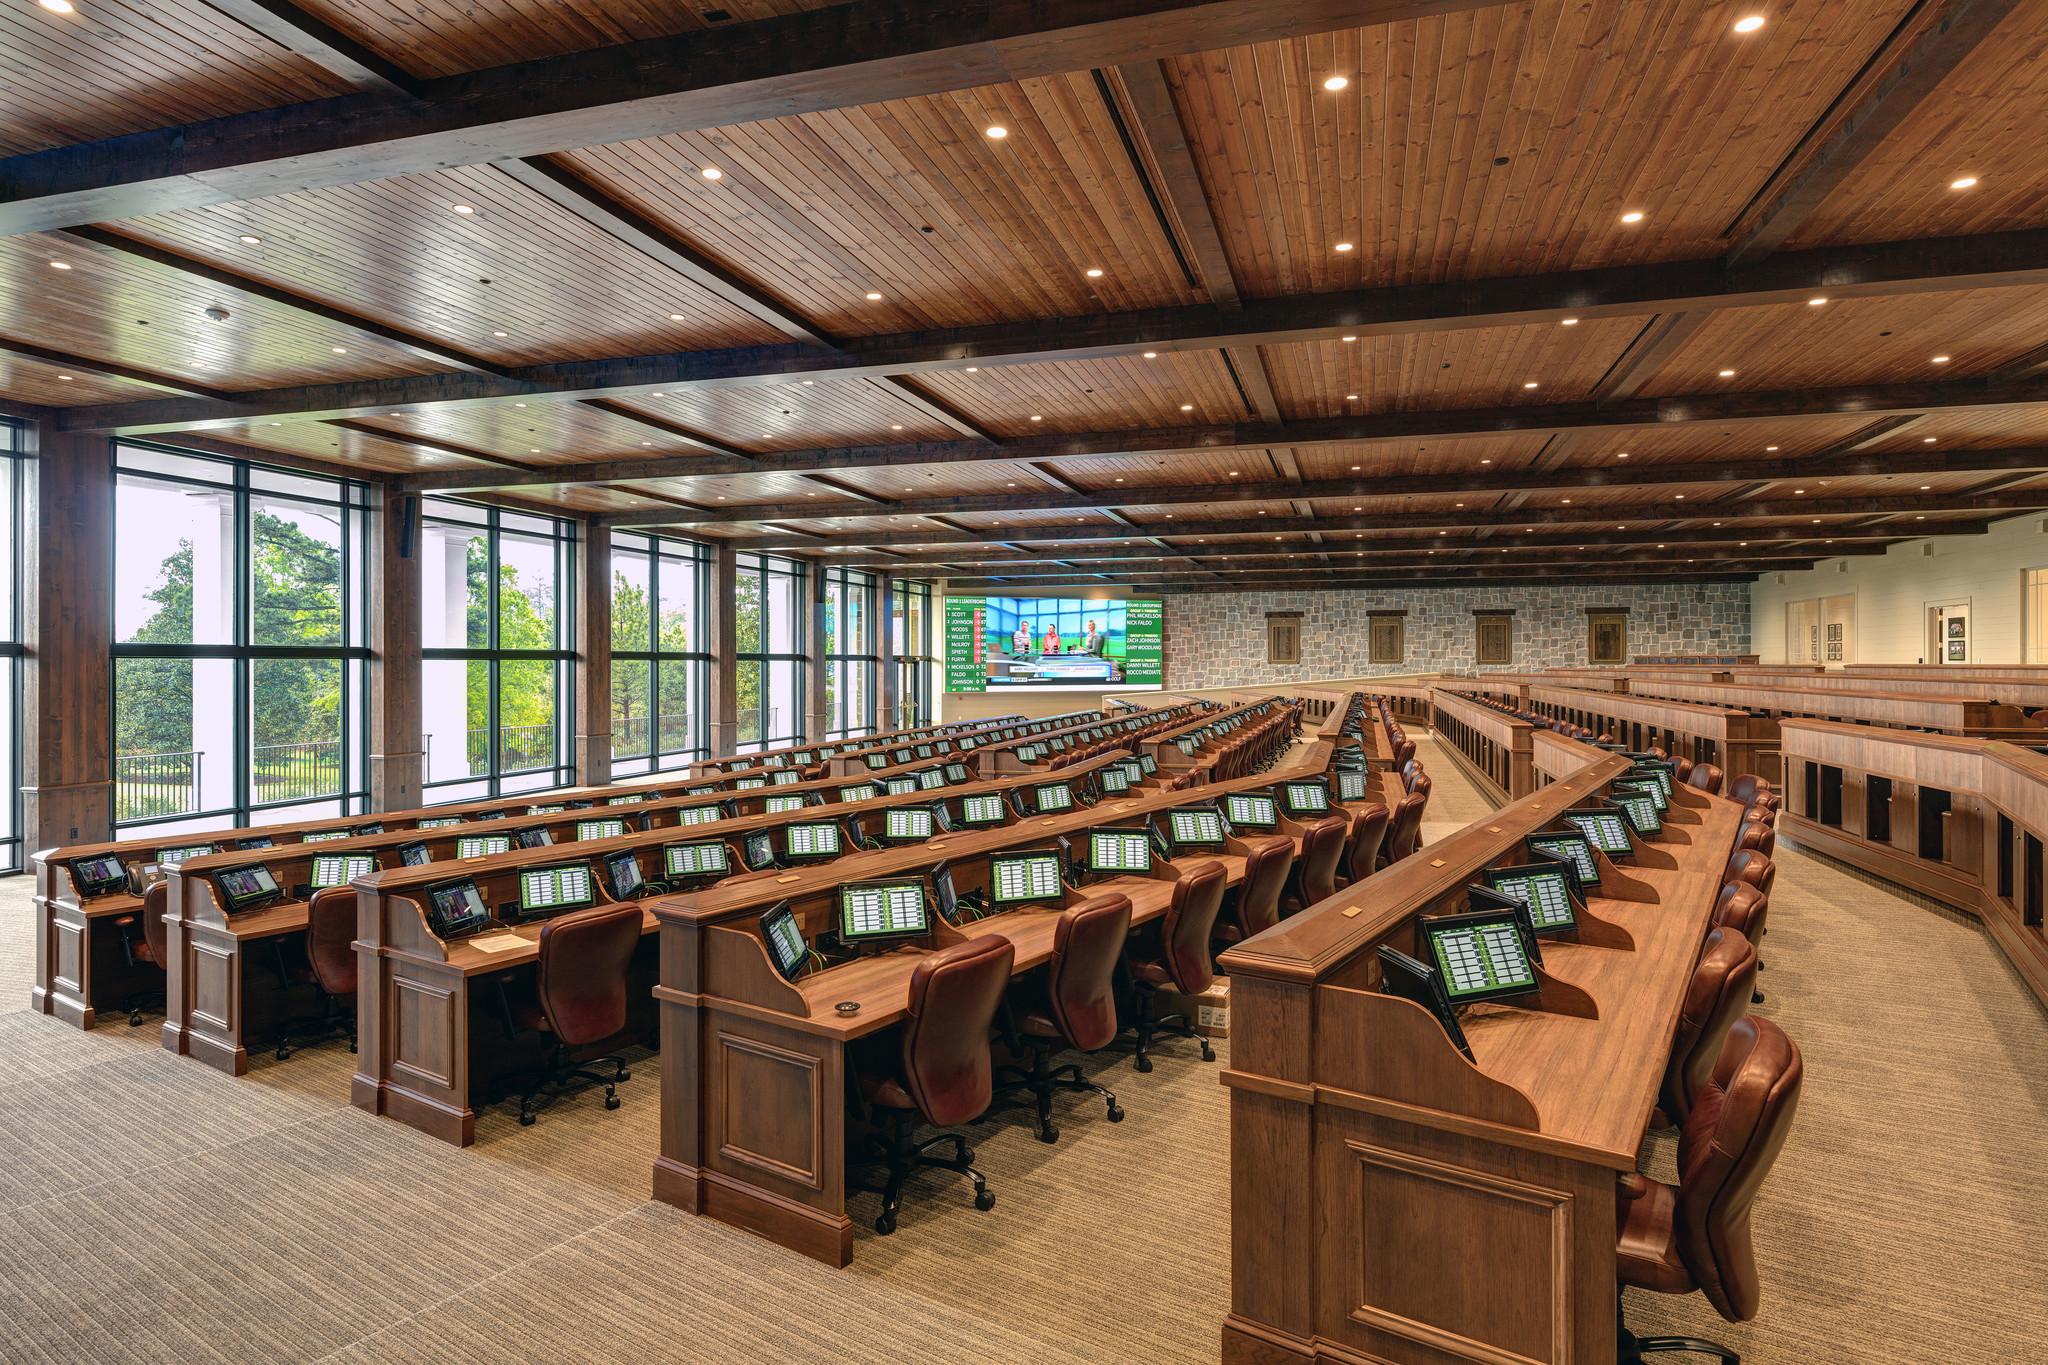 masters lavish new press building emblematic of augusta